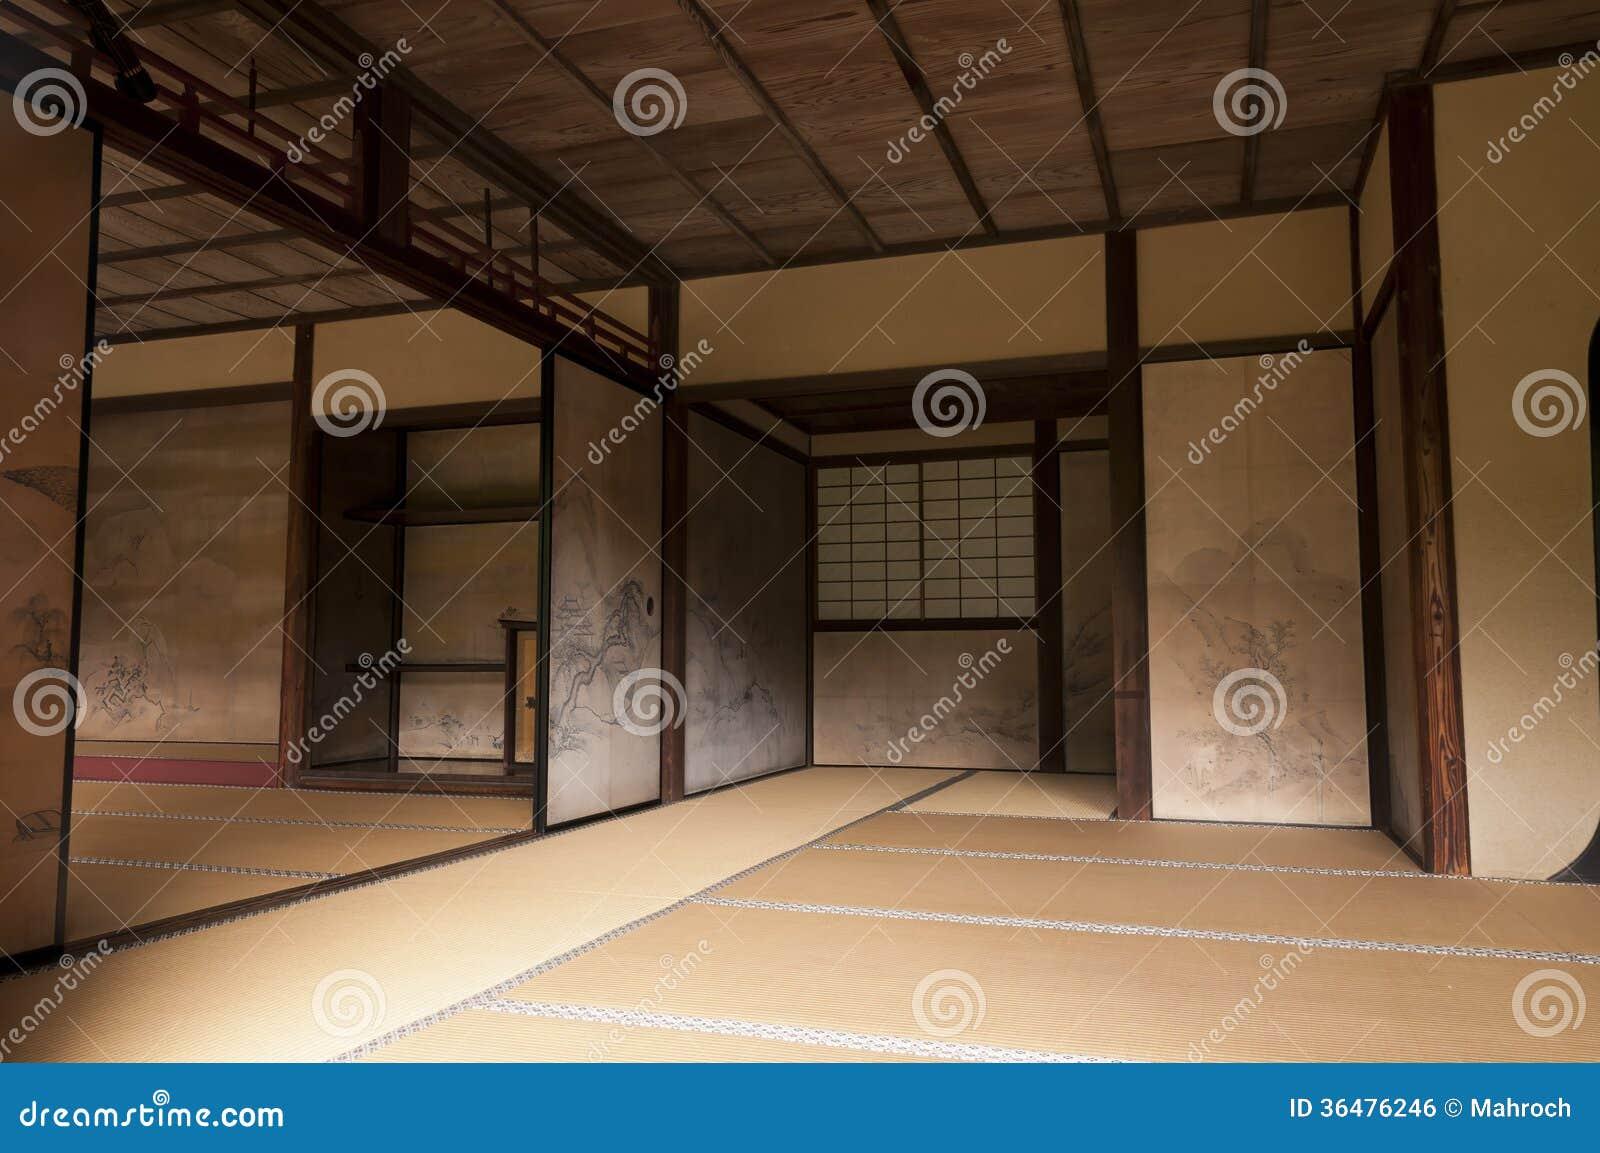 japanese interior house walls decorated by tanyu kano royalty free